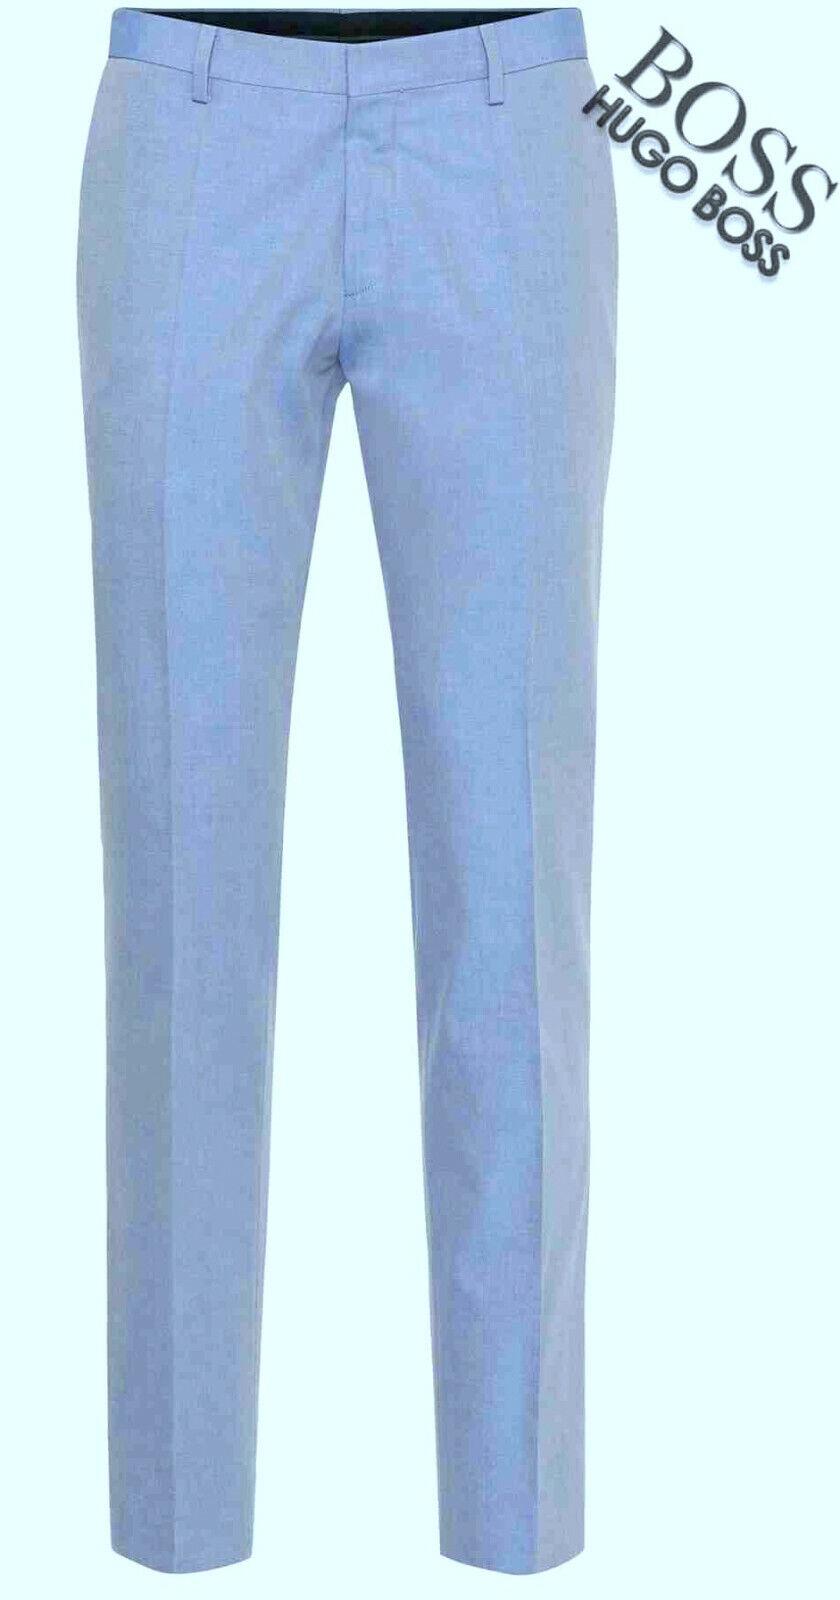 187ae6d7 HUGO BOSS GENESIS2 LIGHT blueE VISCOSE VISCOSE VISCOSE FLAT CASUAL OR DRESS  PANTS US 38 MINT 2d959f